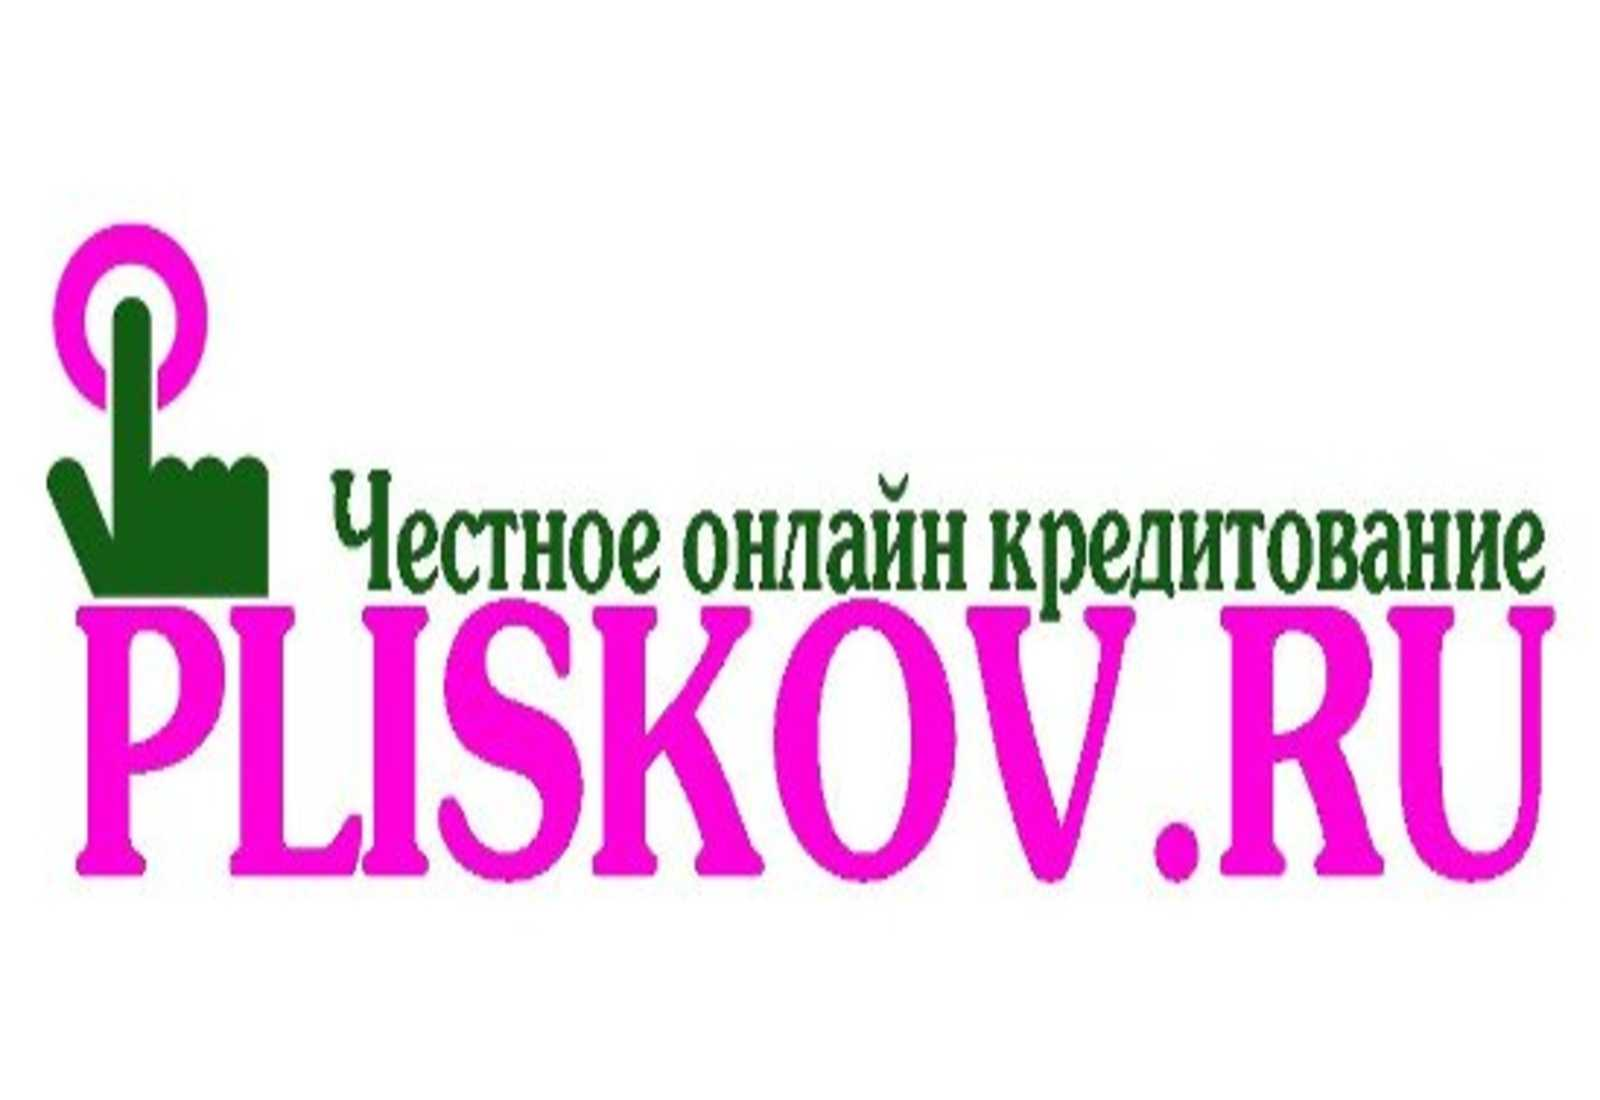 Заим в МФК Pliskov.ru